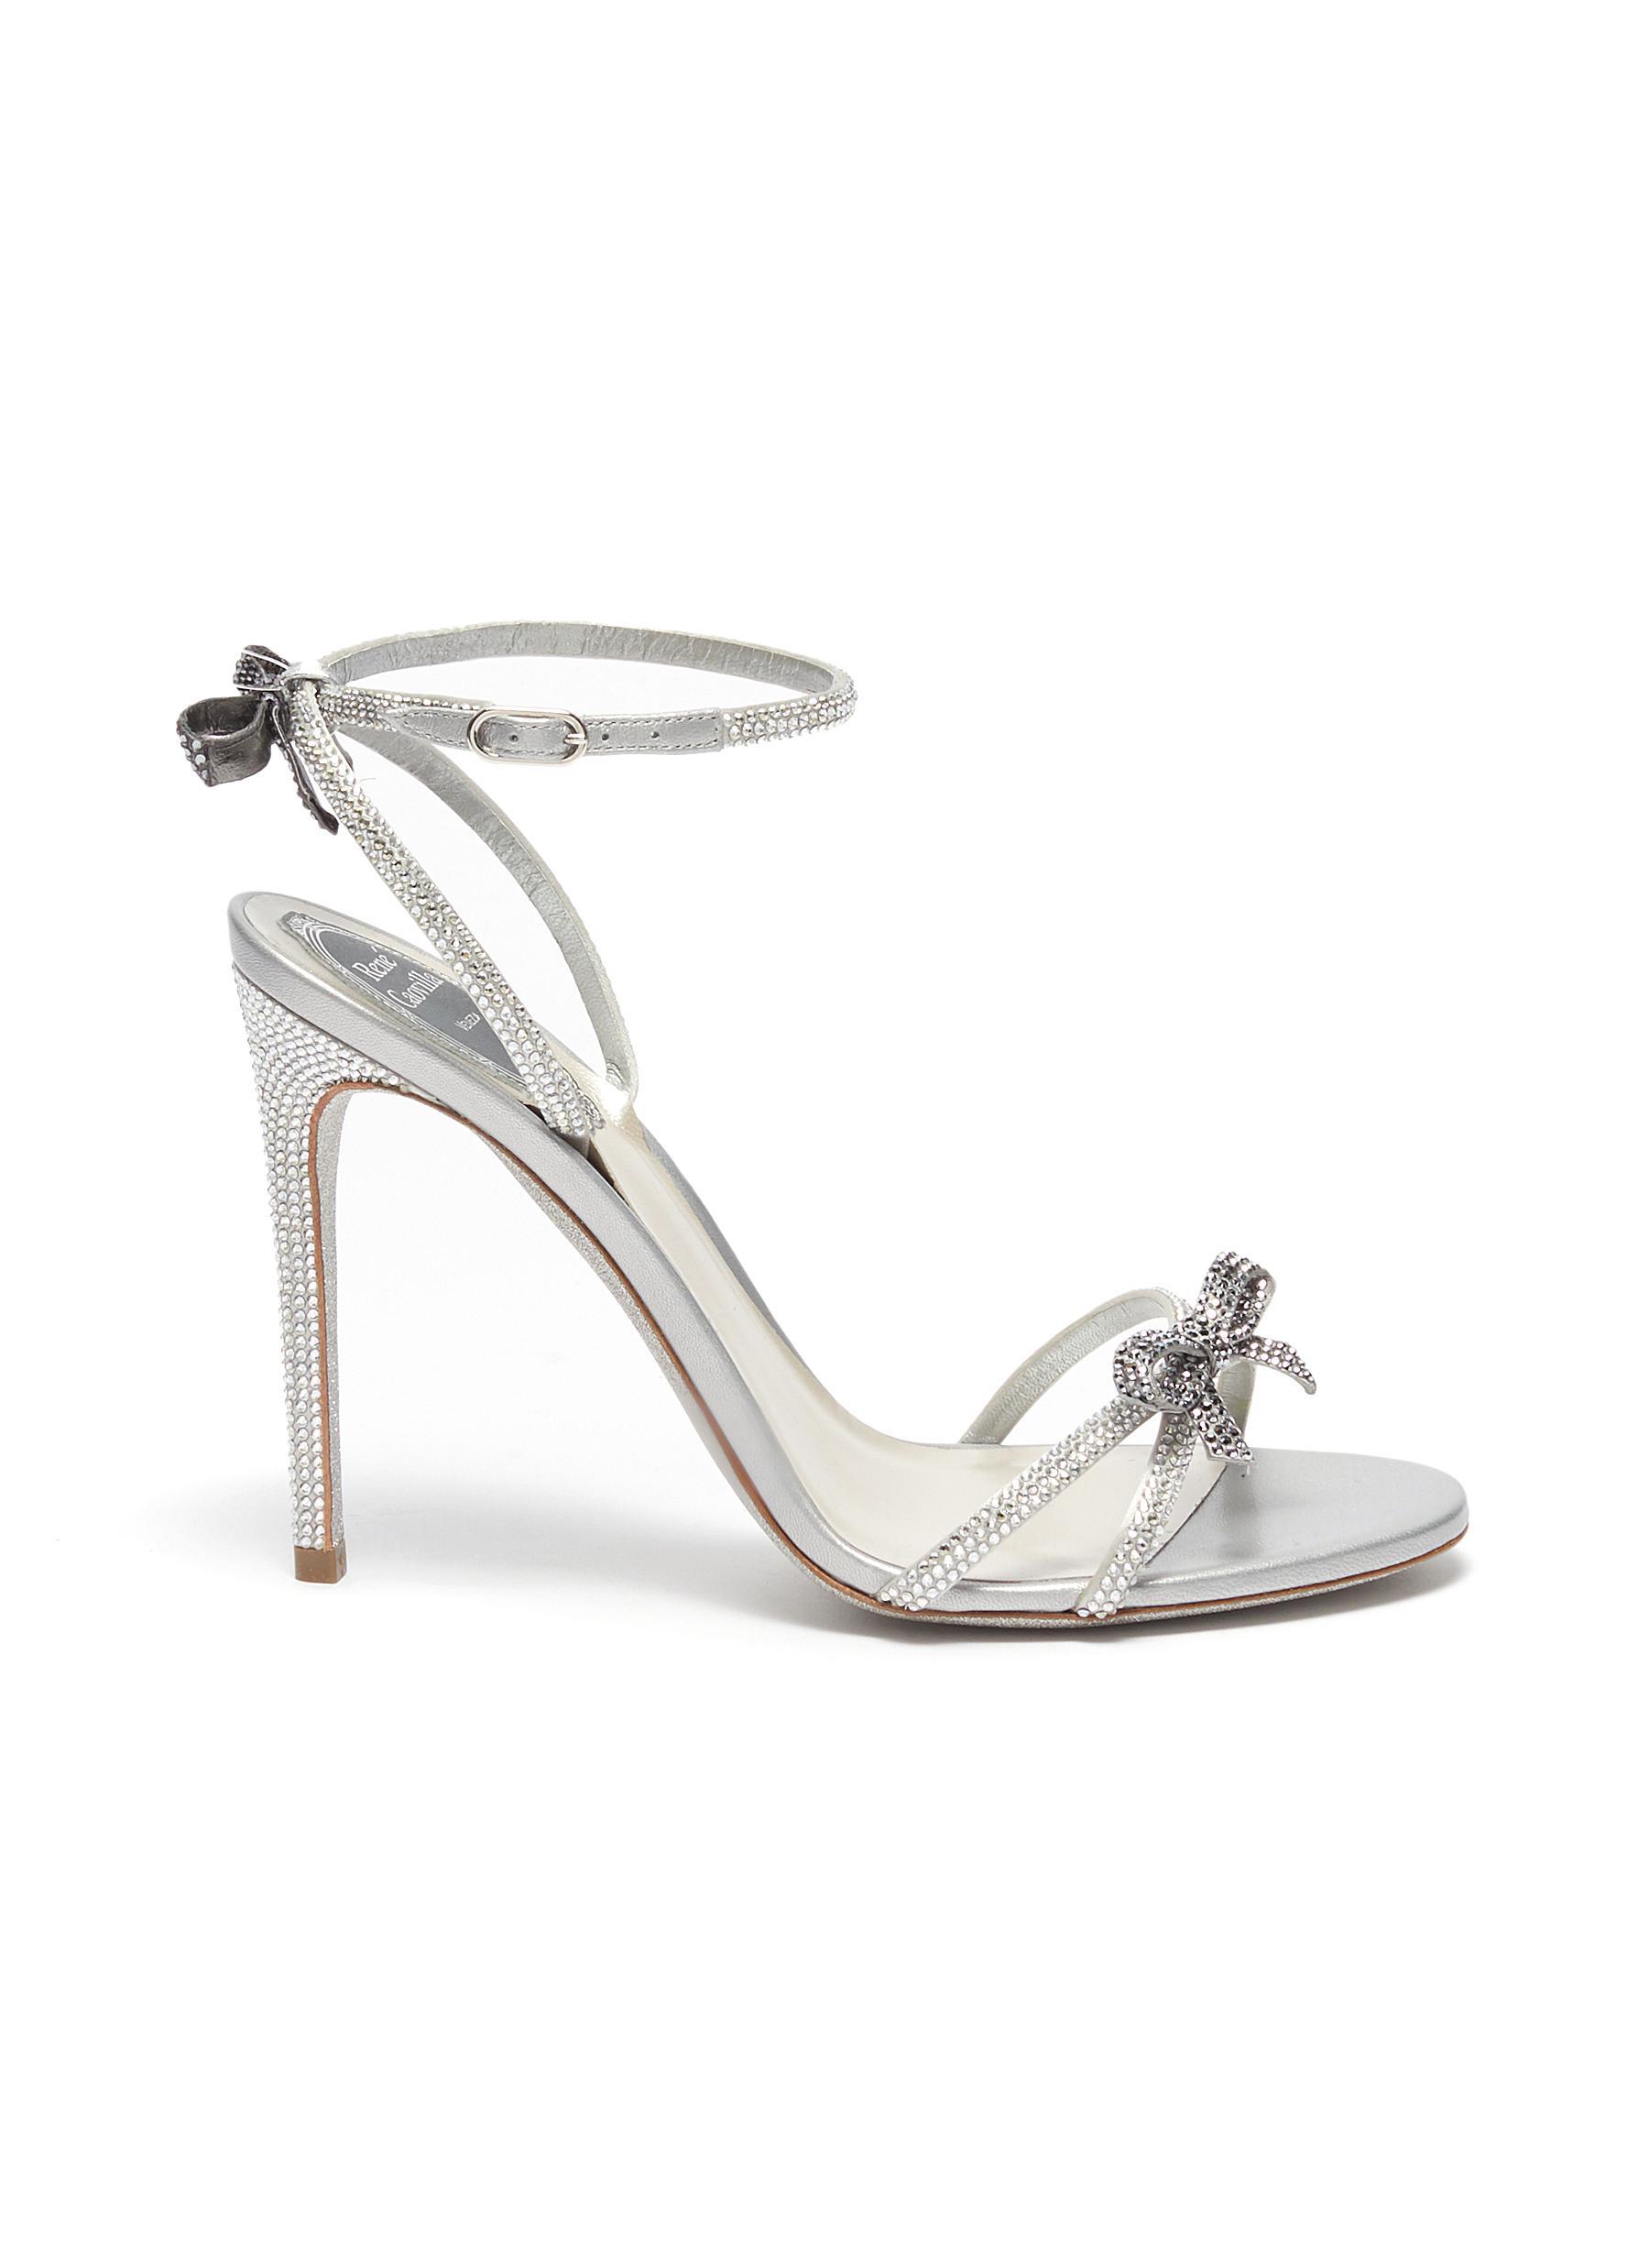 René Caovilla High Heels Bow cross strap strass embellished heels